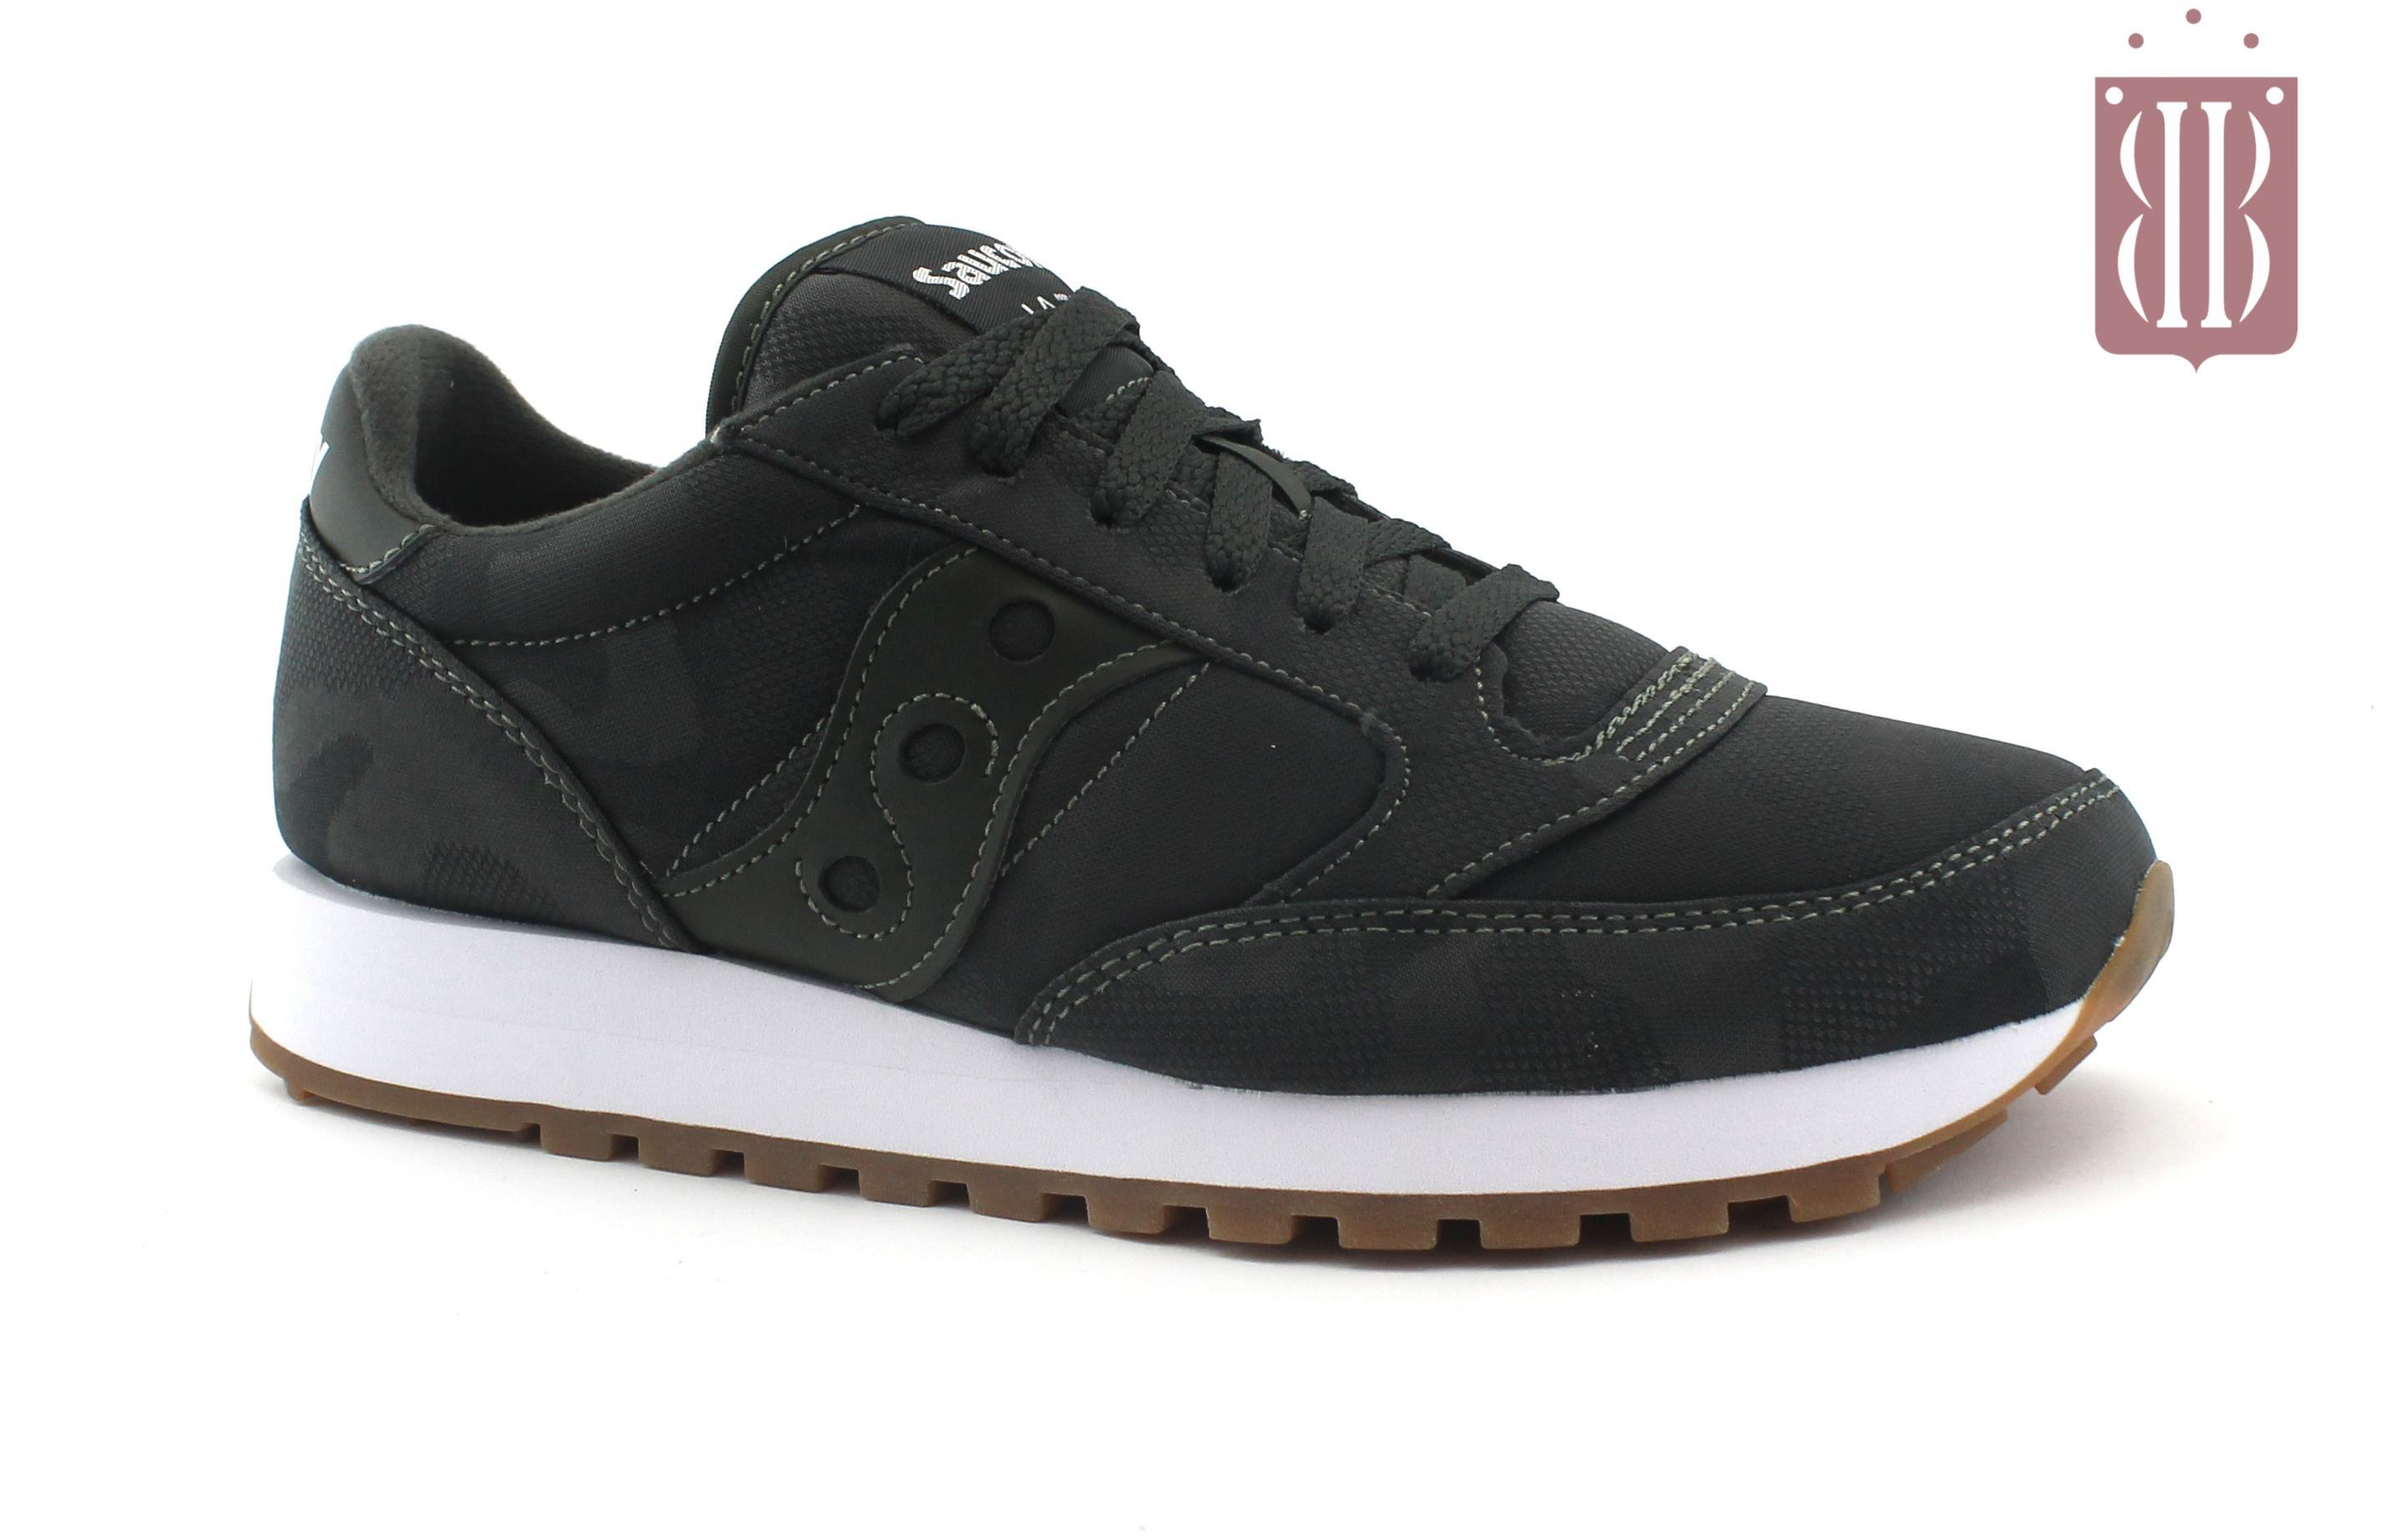 SAUCONY S60445 5 JAZZ ORIGINAL CAMO grigio verde scarpe donna sneakers lacci